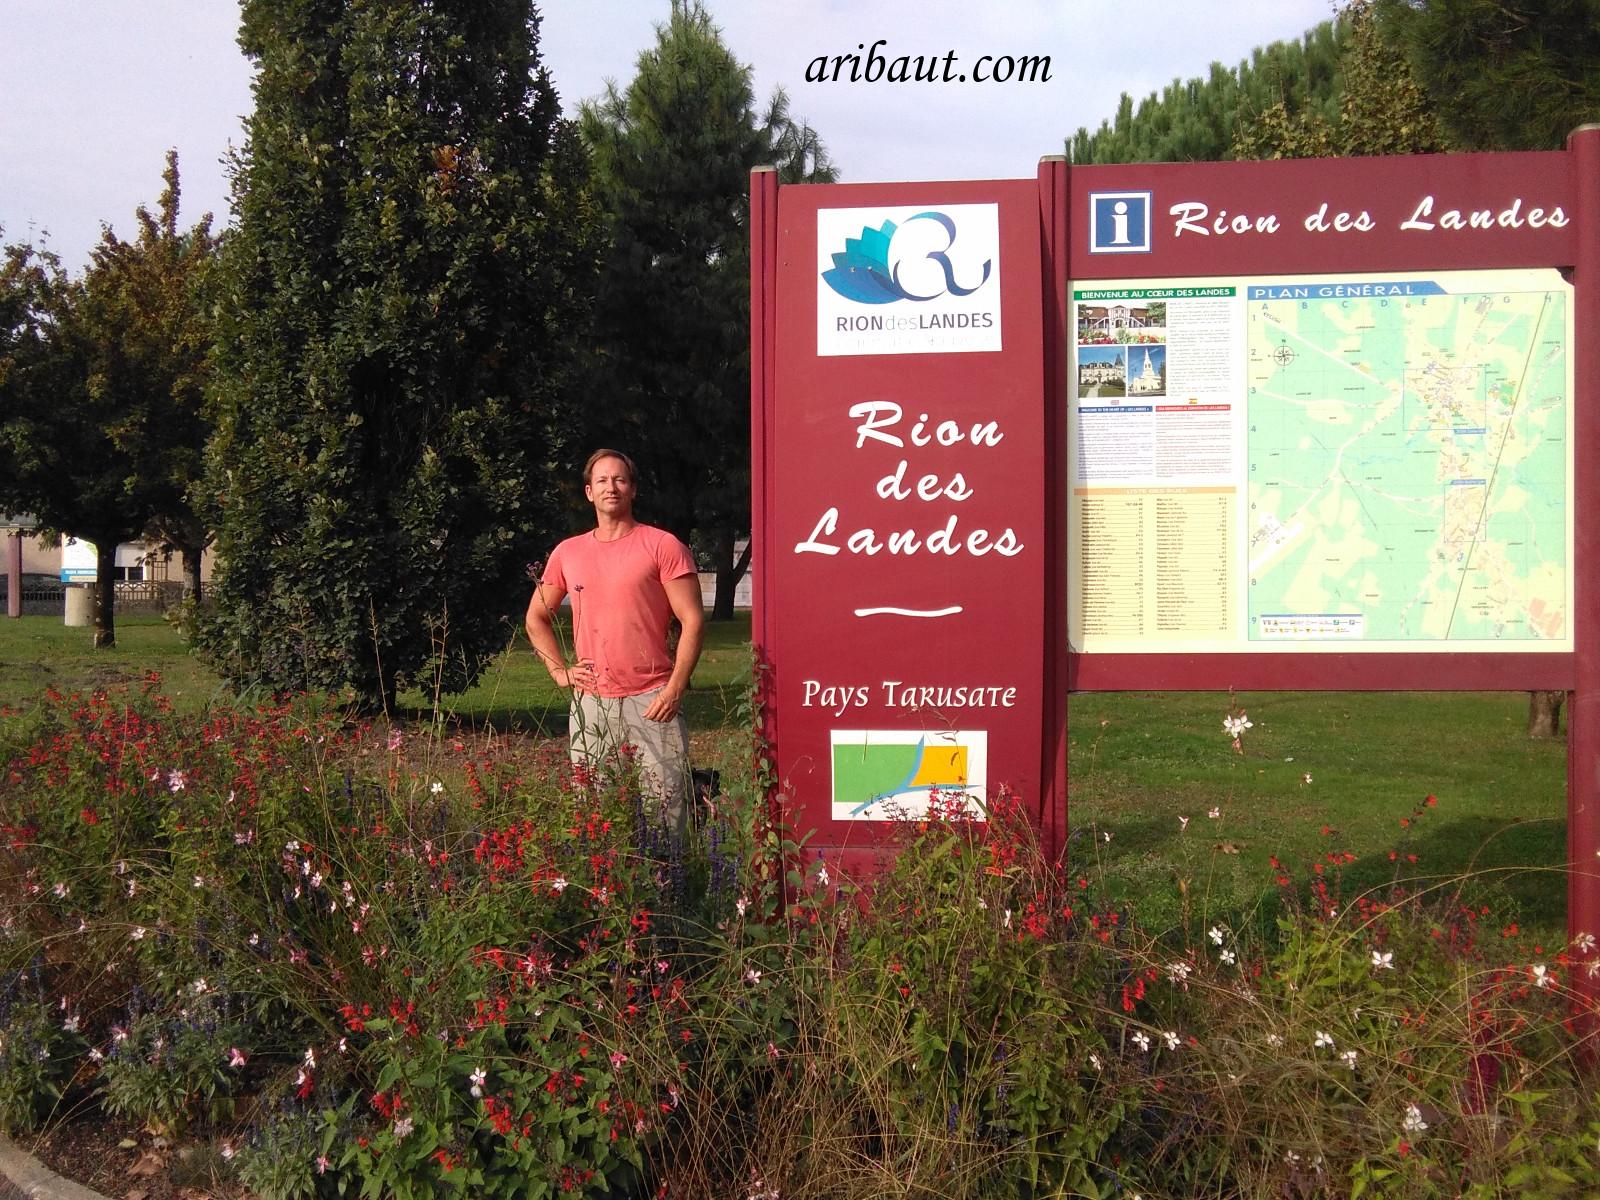 pierre-aribaut-zetrader-france-rion-des-landes-region-dax-landes-18-octobre-2018-panneau-ville.jpg